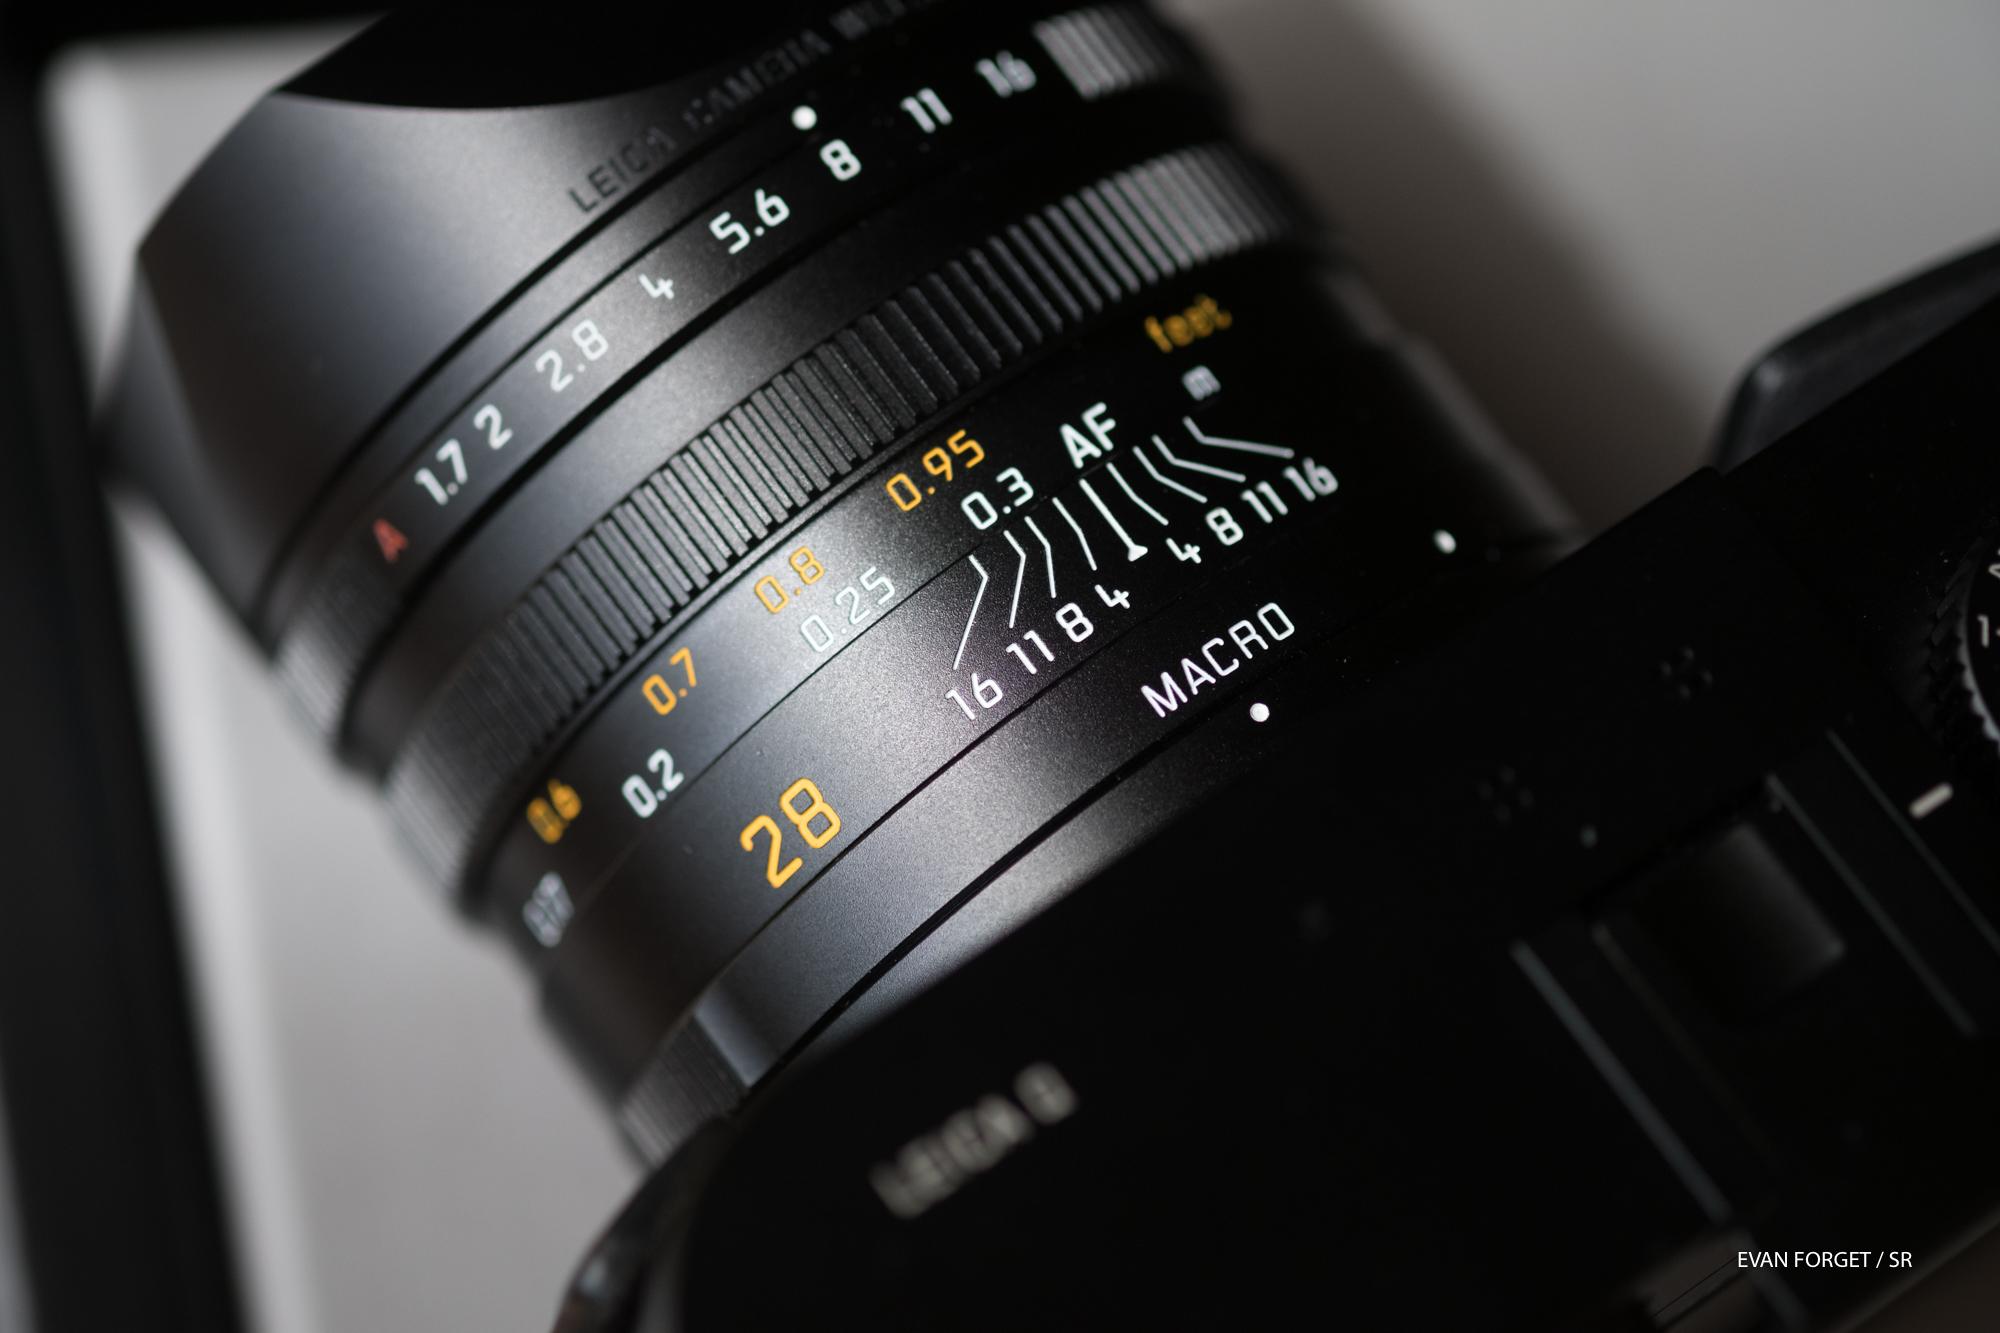 L'objectif Summilux 28mm macro f/1.7 du Lecia Q.